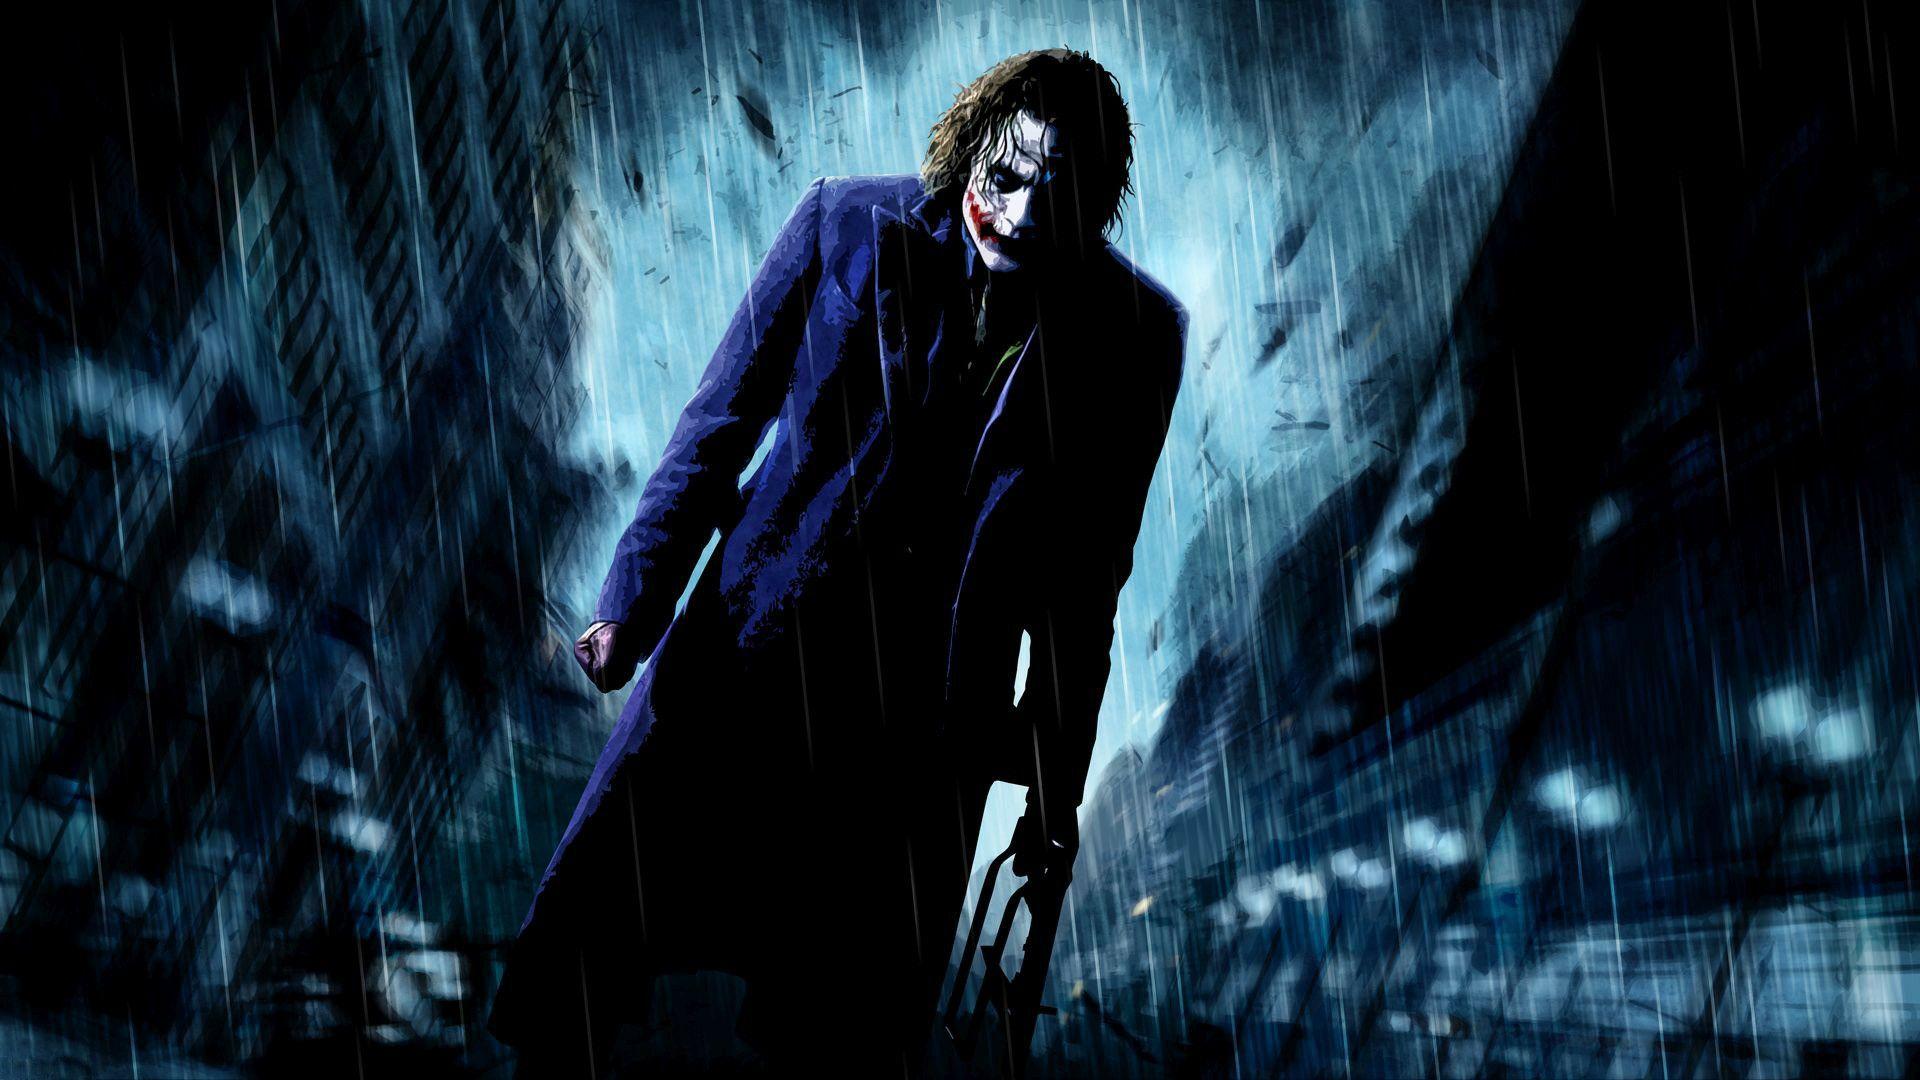 Pin By Iamakilldiot On Joker World Joker Wallpapers Joker Hd Wallpaper Joker Images